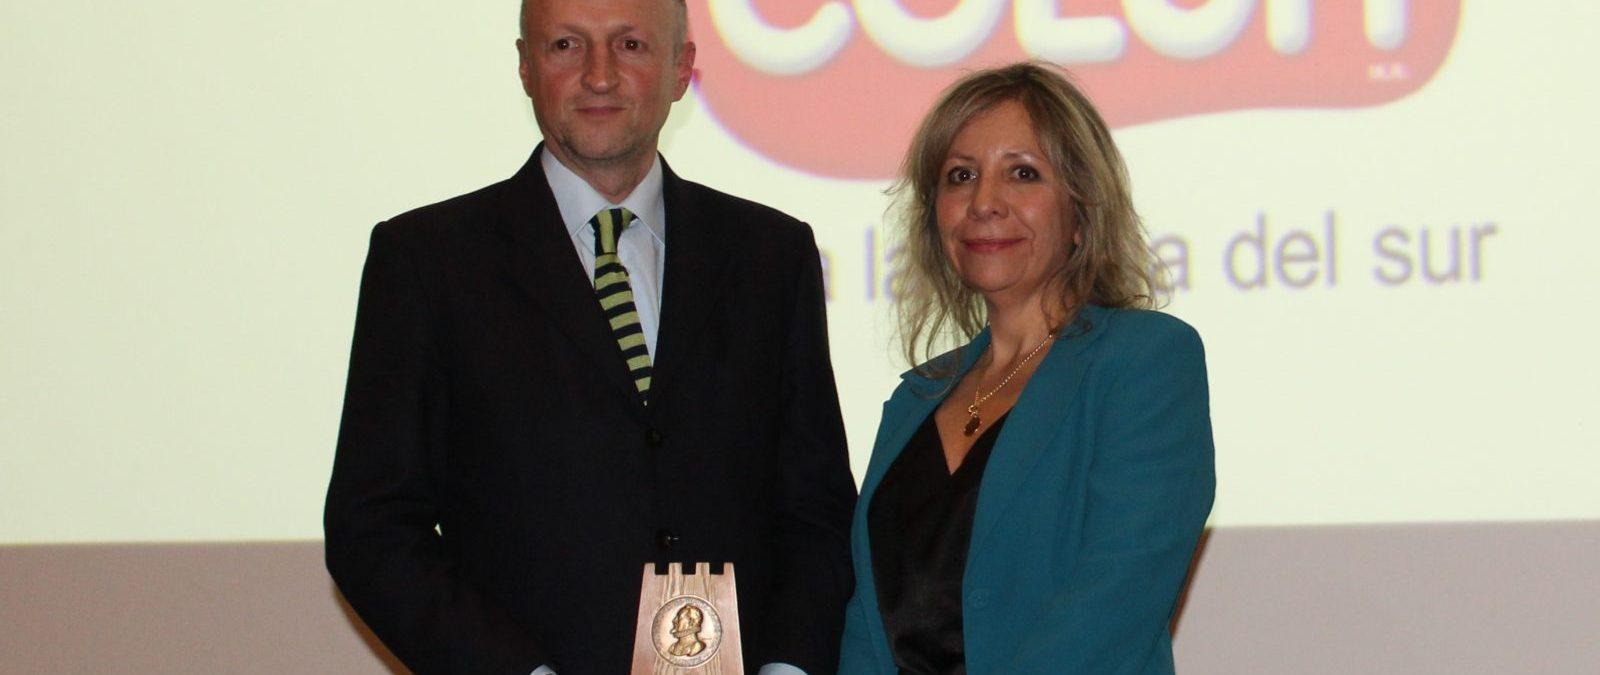 Cámara de Comercio e Industrias de Valdivia celebró 111° aniversario reconociendo aporte de Colun